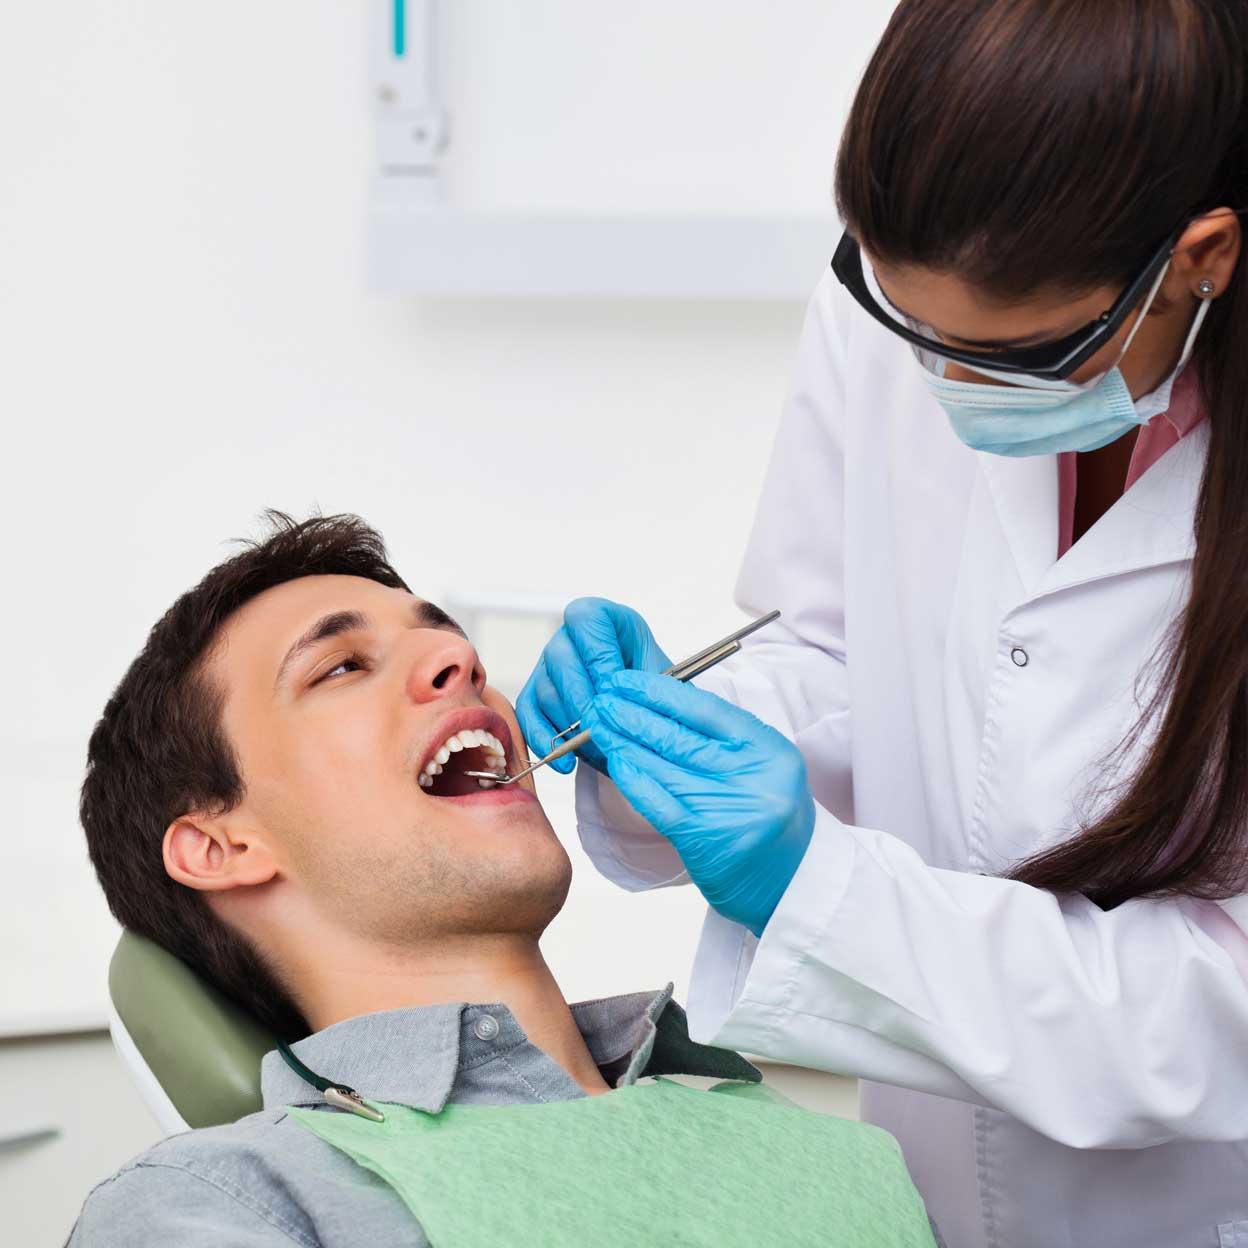 dental_thumb_5_crop.jpg